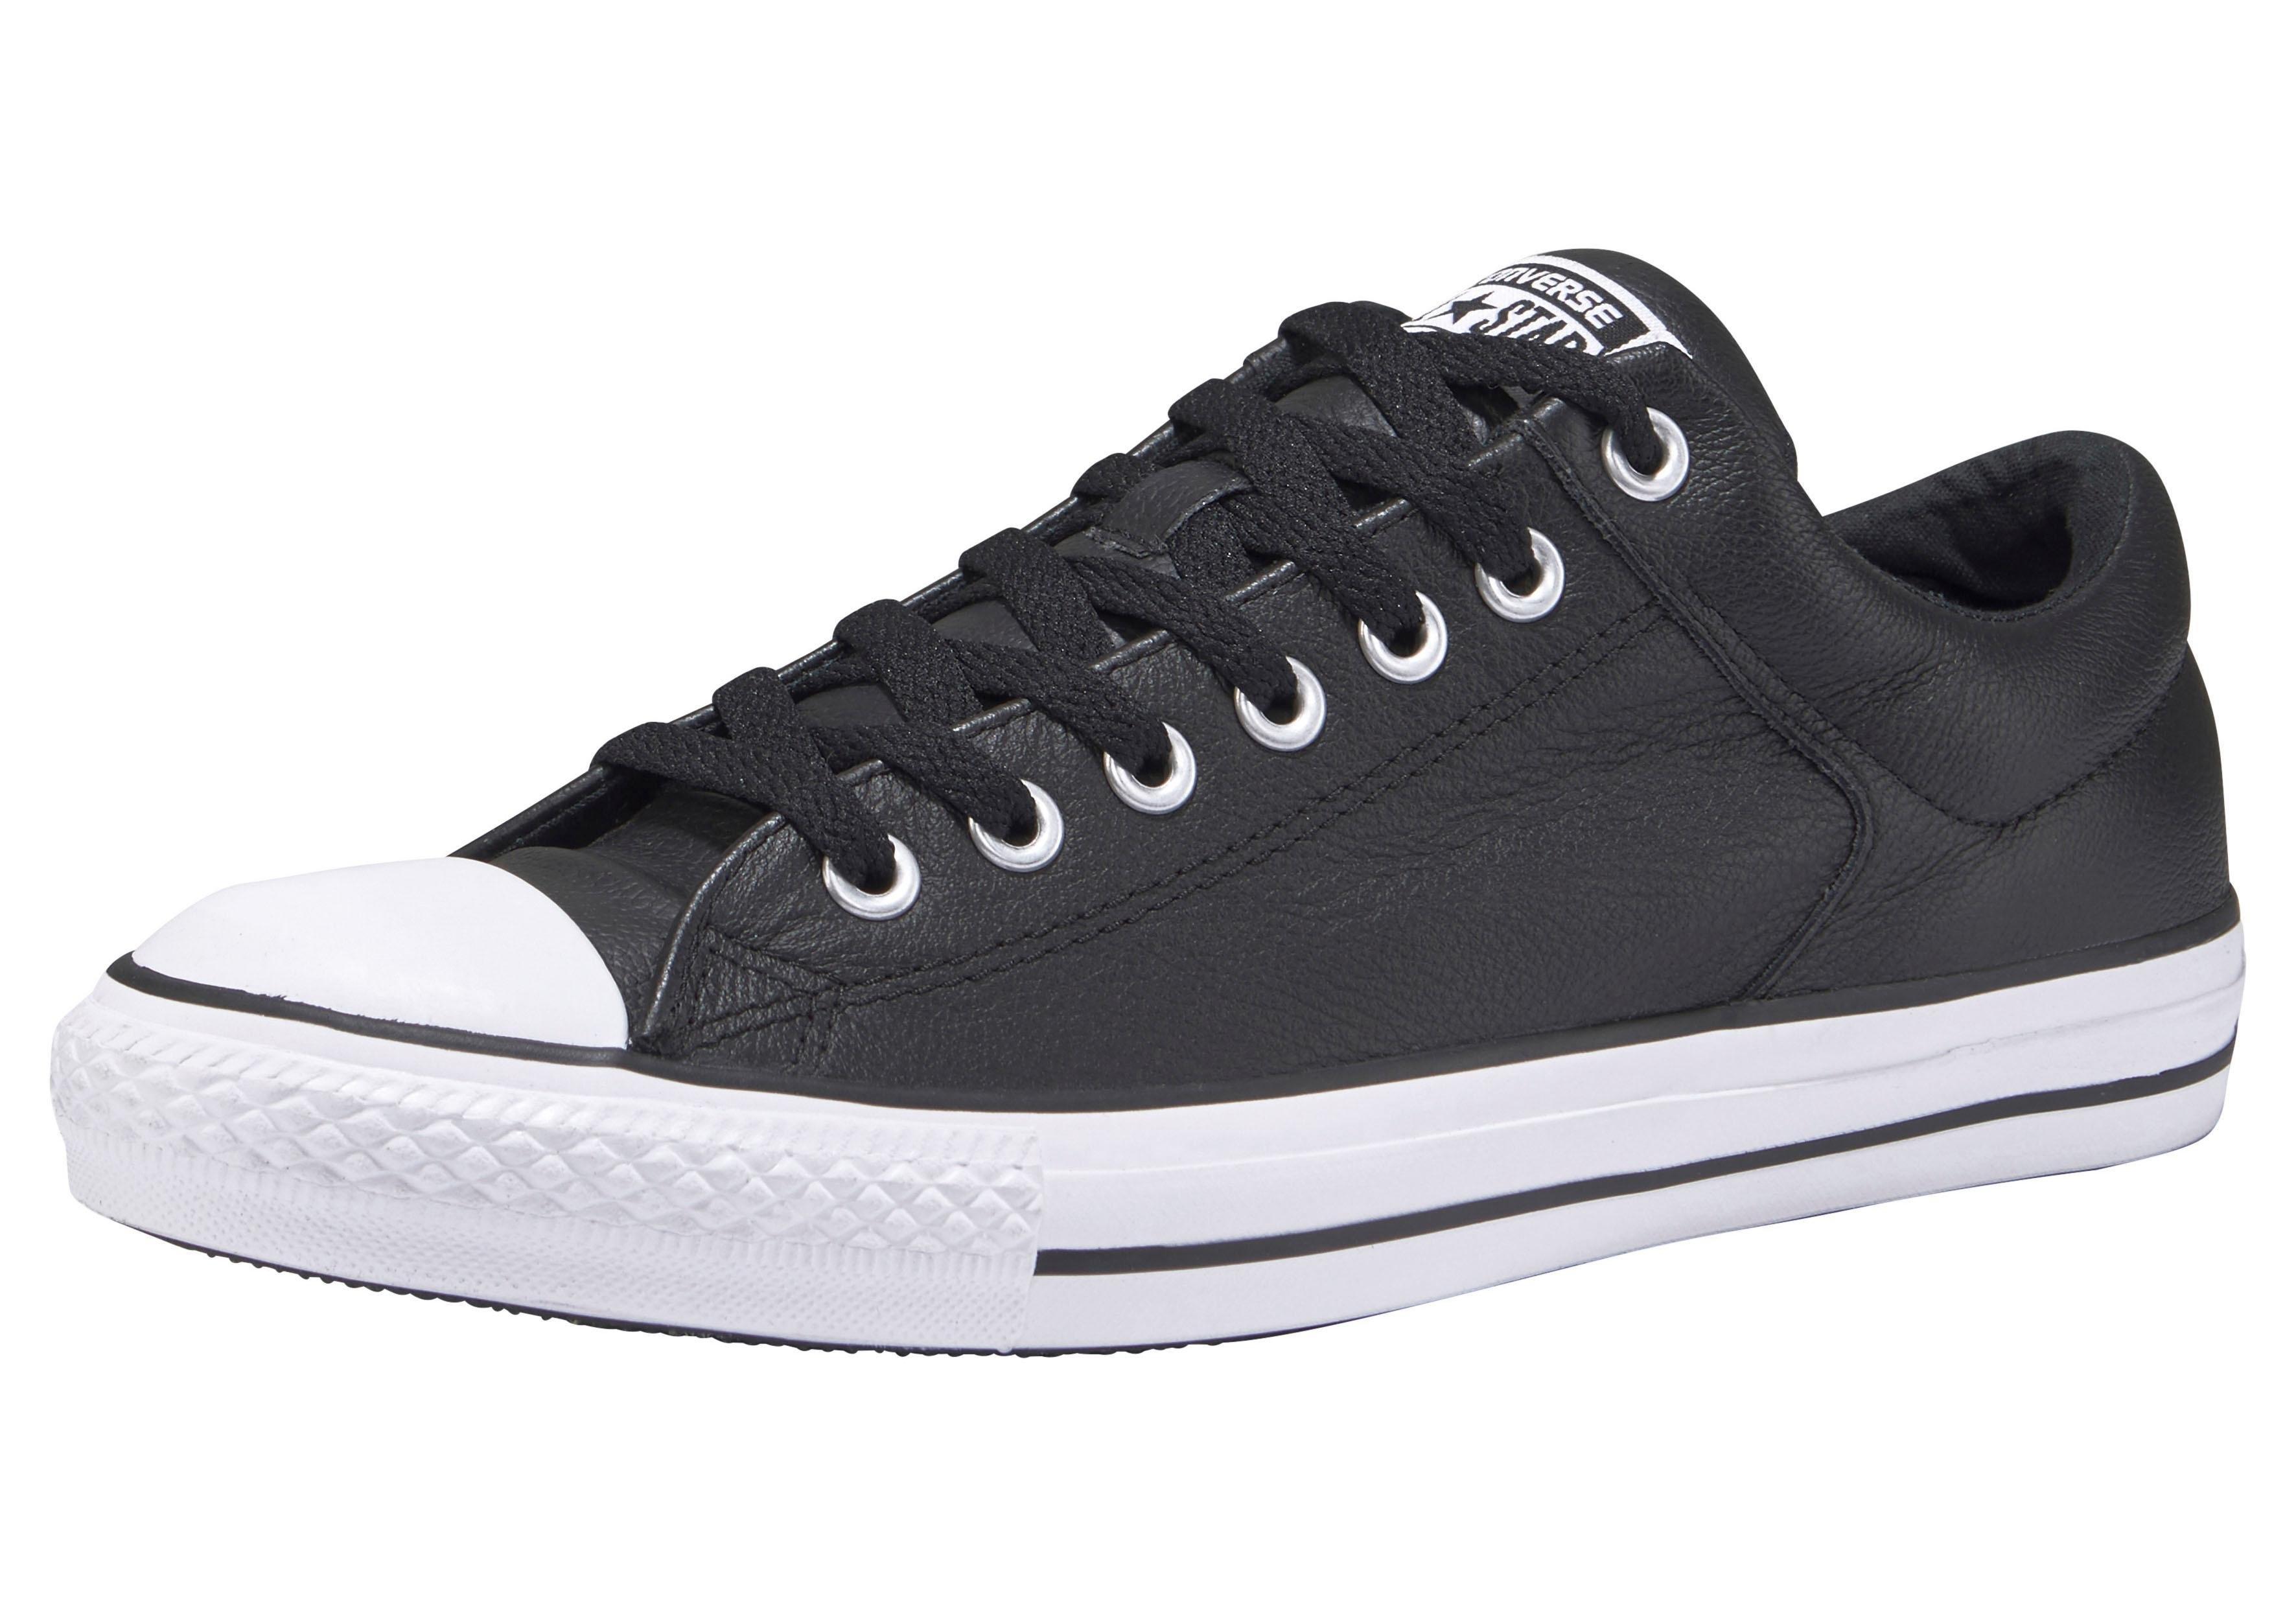 d5e2ceec022 Afbeeldingsbron: Converse sneakers »Chuck Taylor All Star High Street Ox«